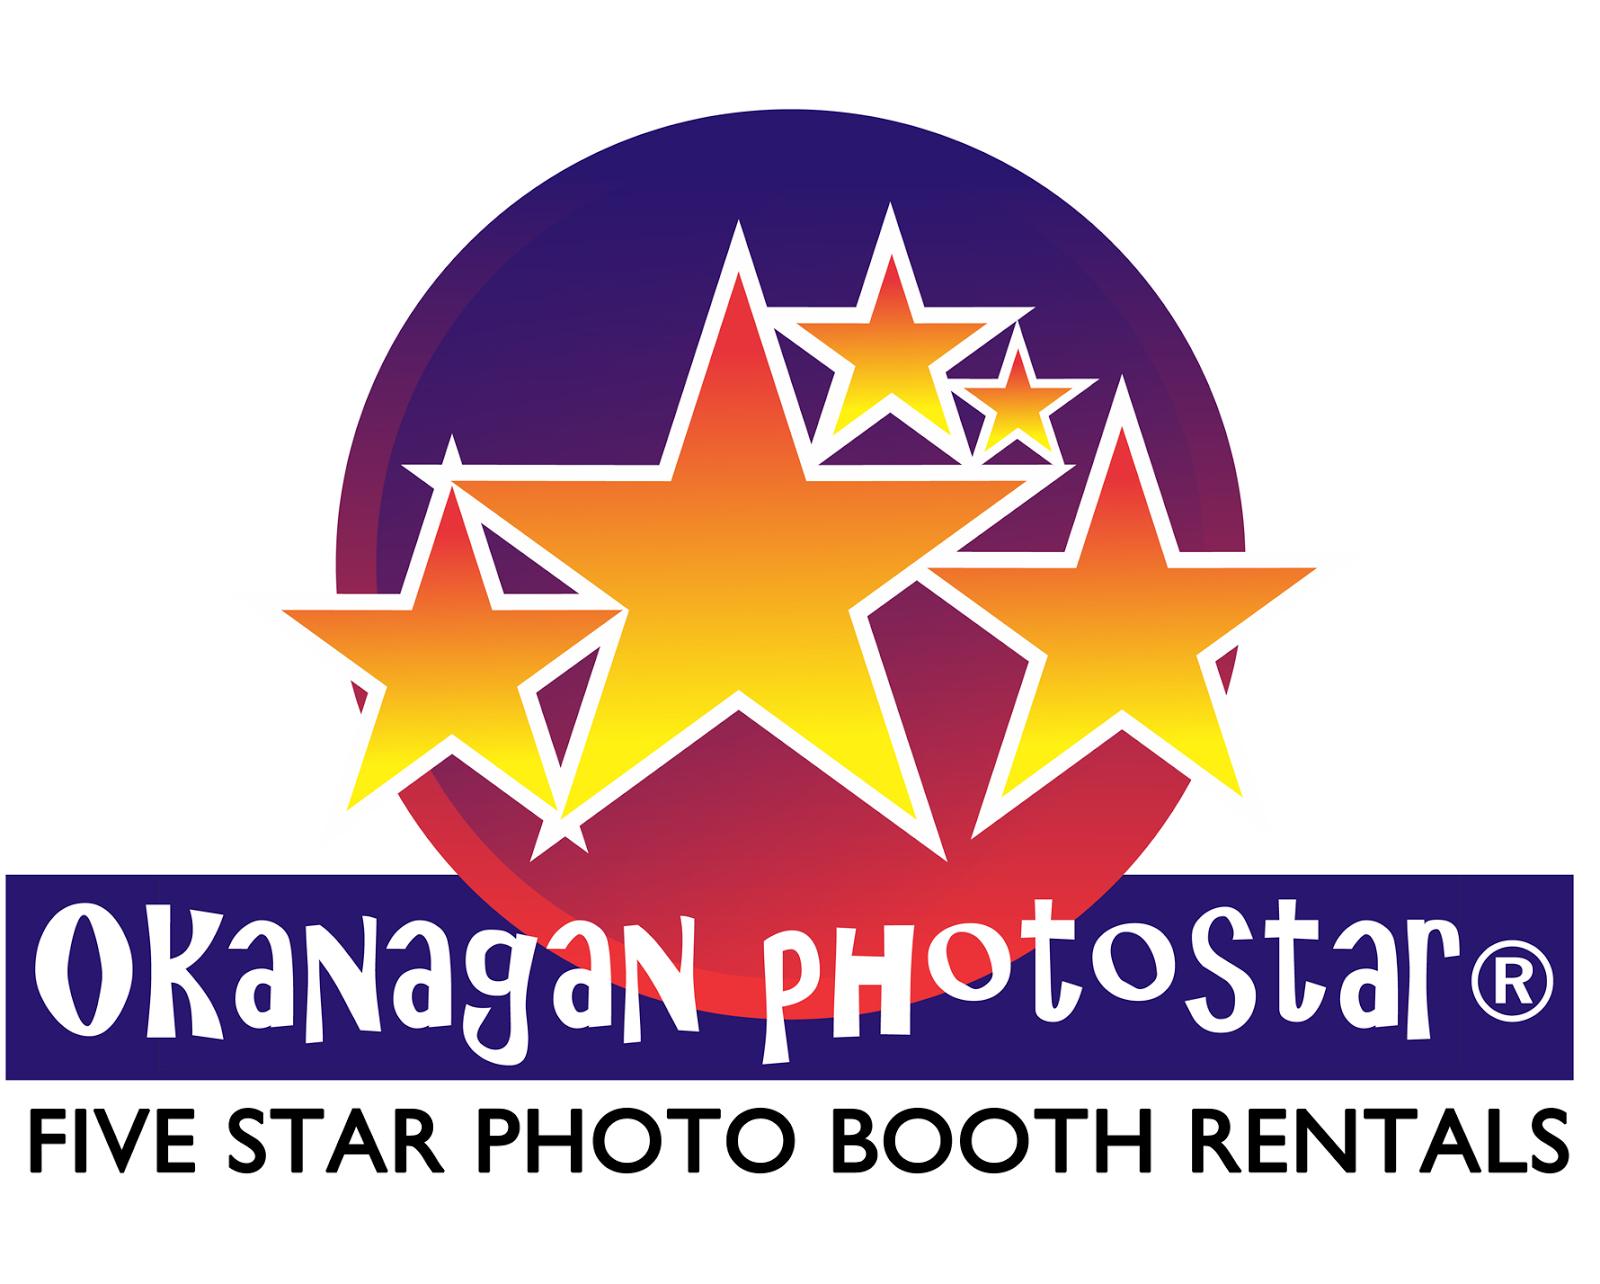 Okanagan PHOTOSTAR® Five Star Photo Booth Rentals